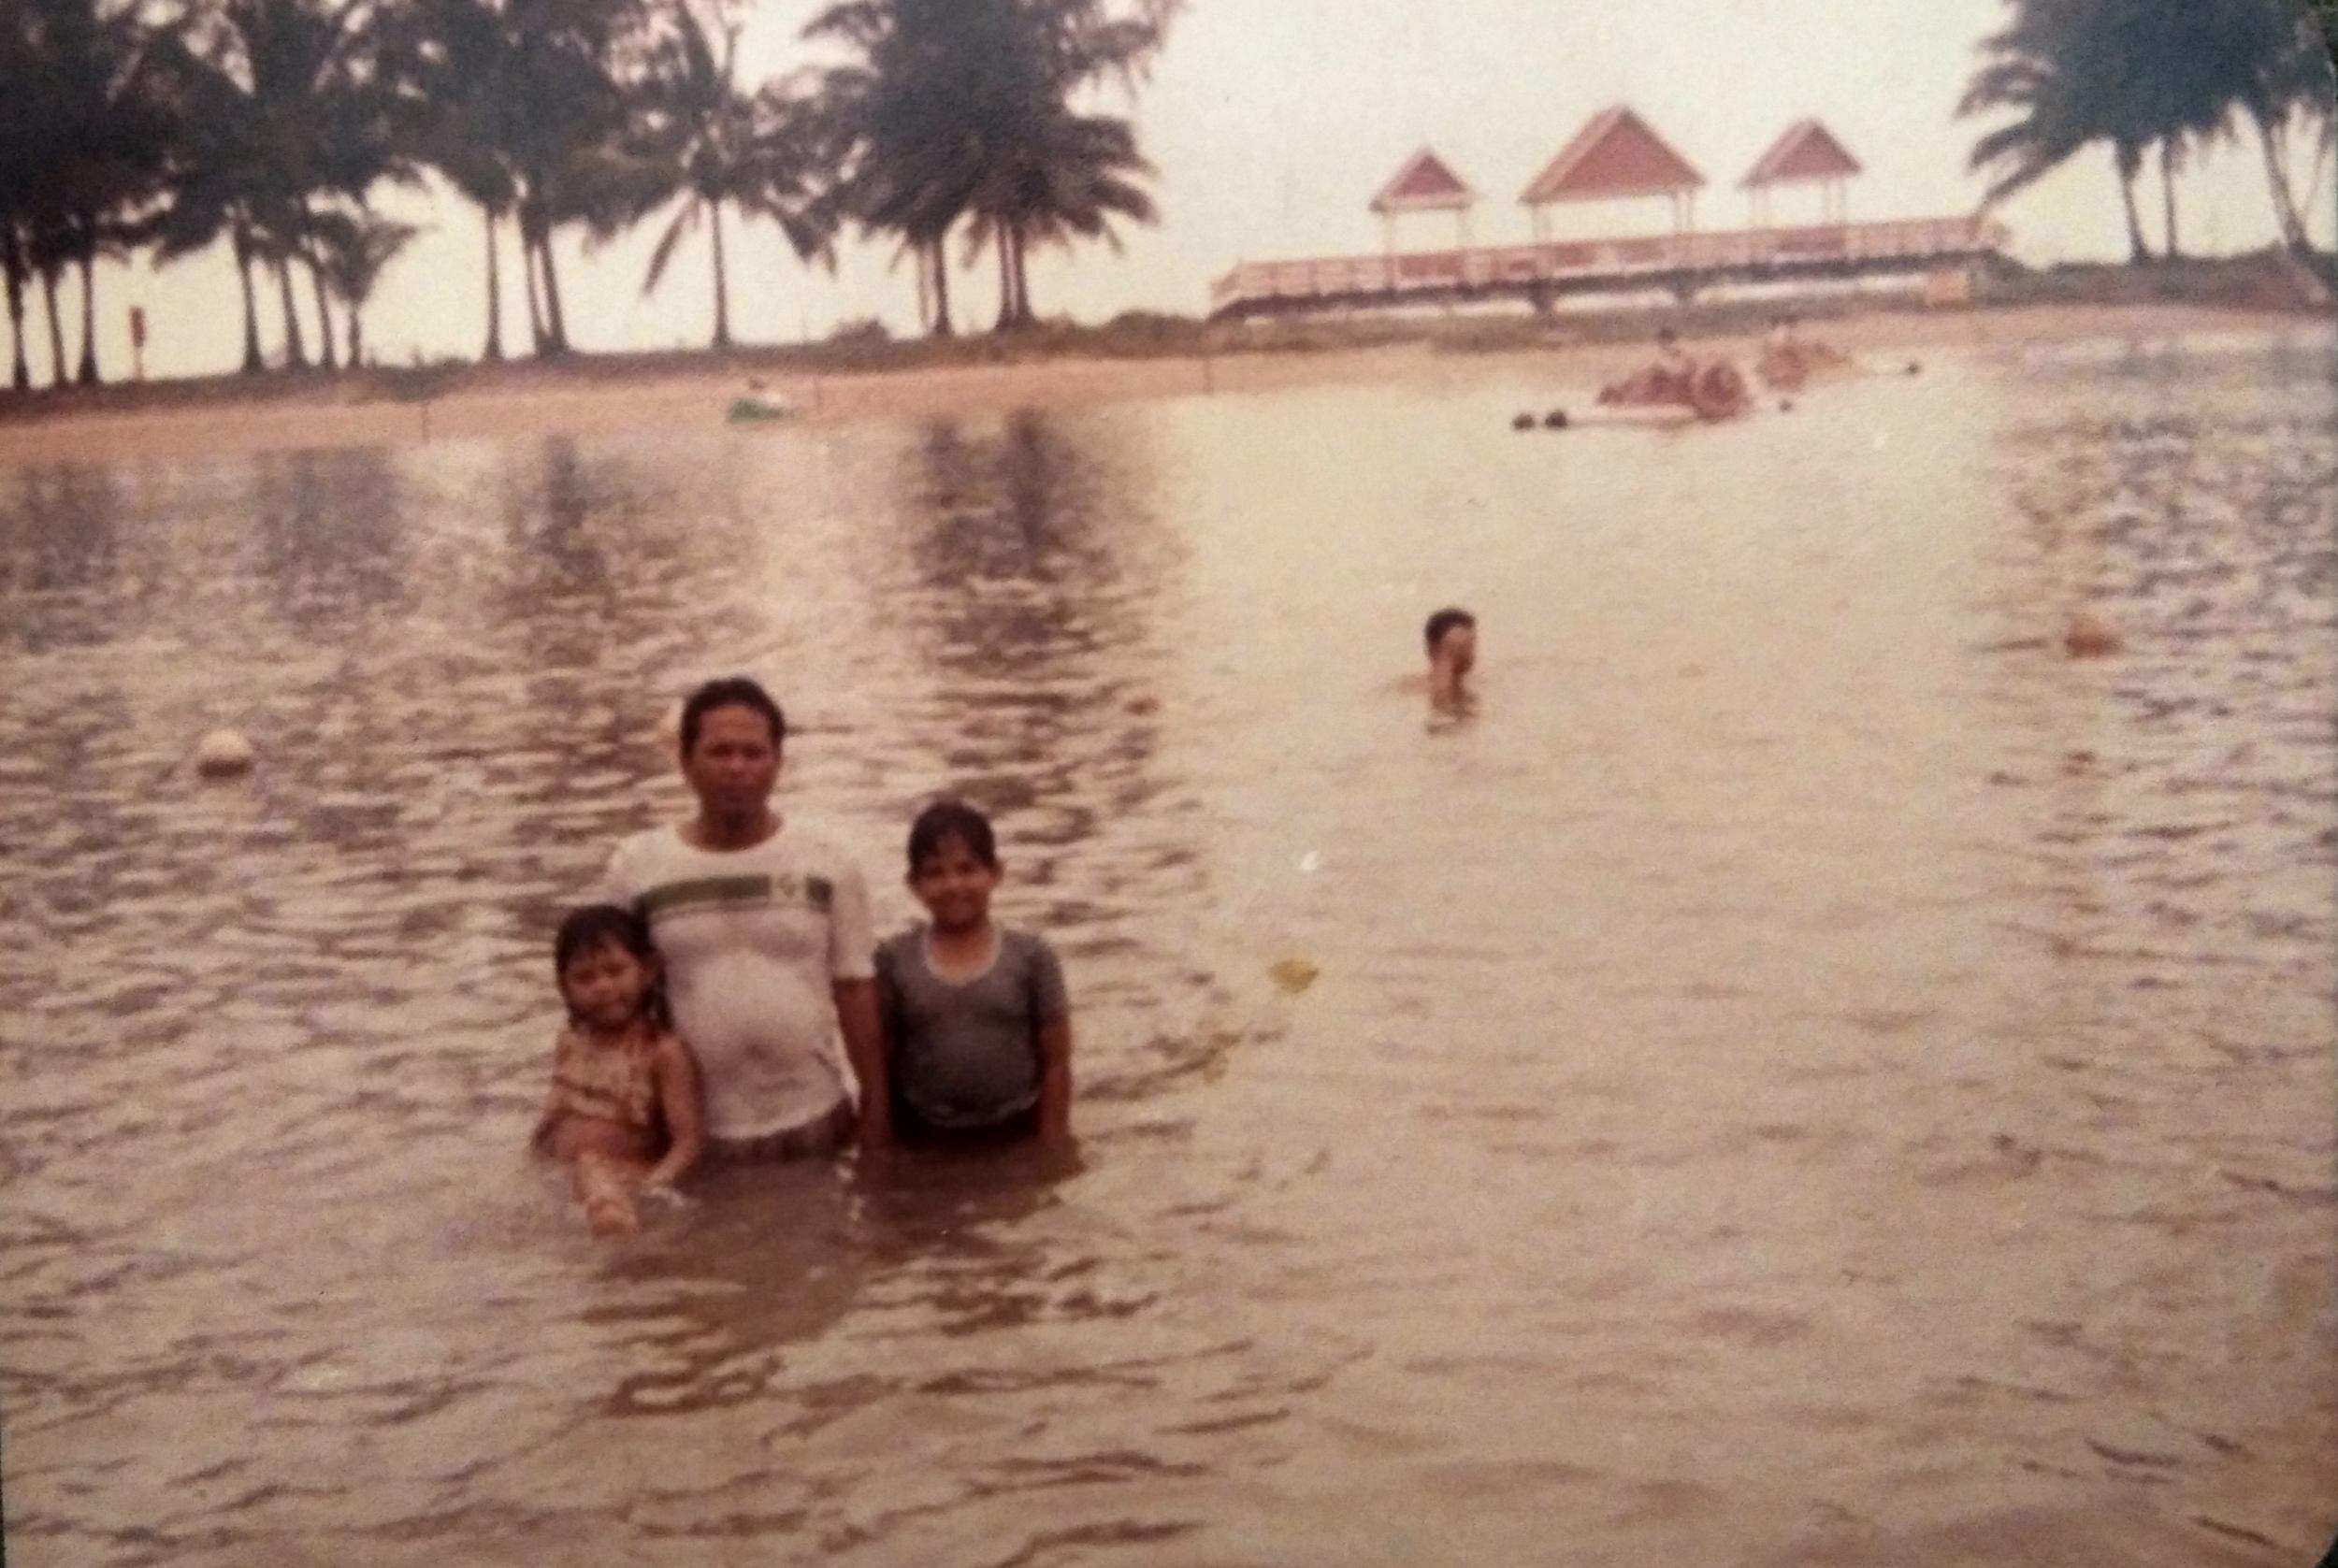 Nenek Faridah's husband and children at Pulau Balakang Mati (Sentosa) in the 1980s.